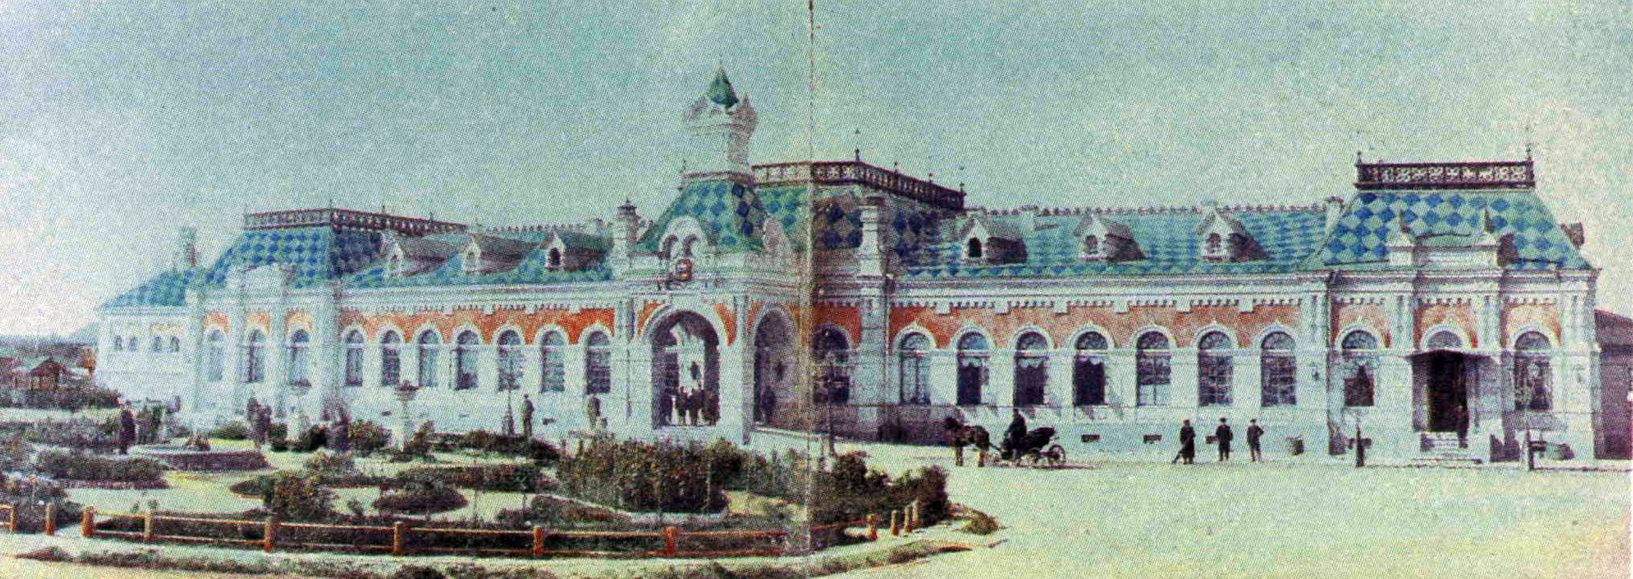 Станция Екатеринбург